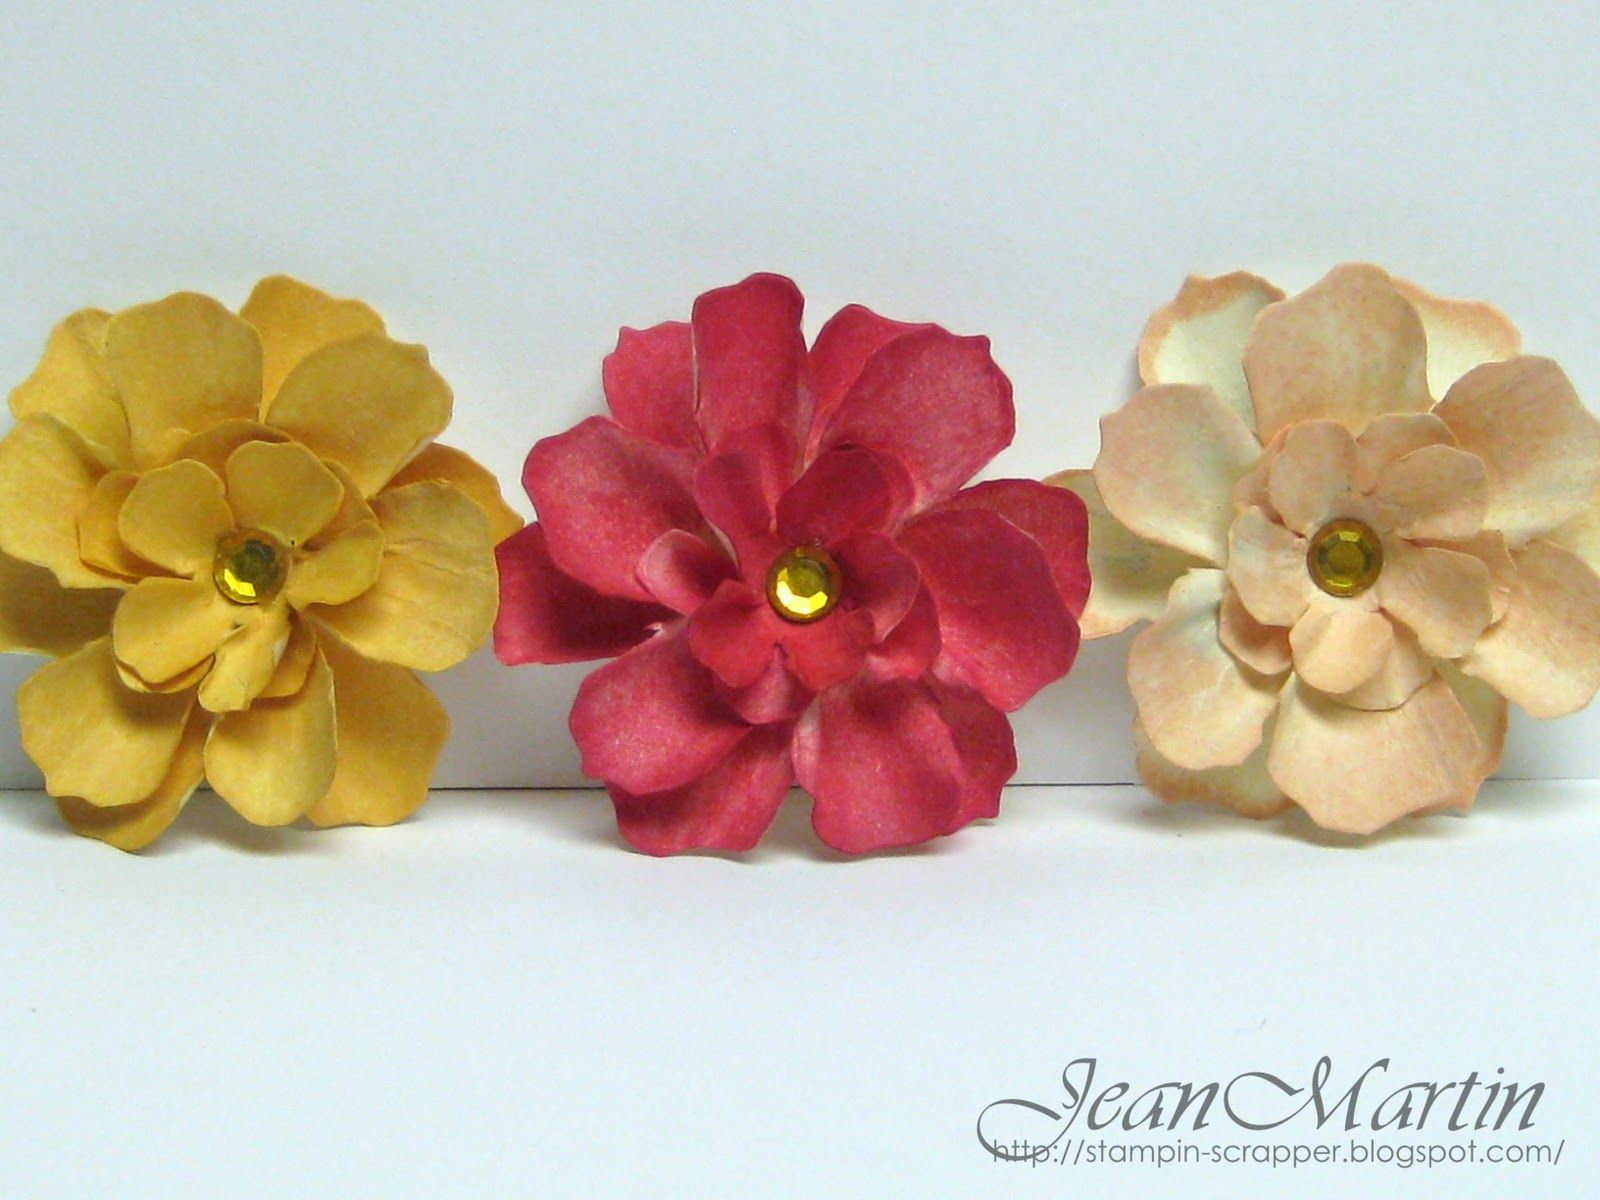 Handmade Flowers Stampin Scrapper Handmade Paper Flowers